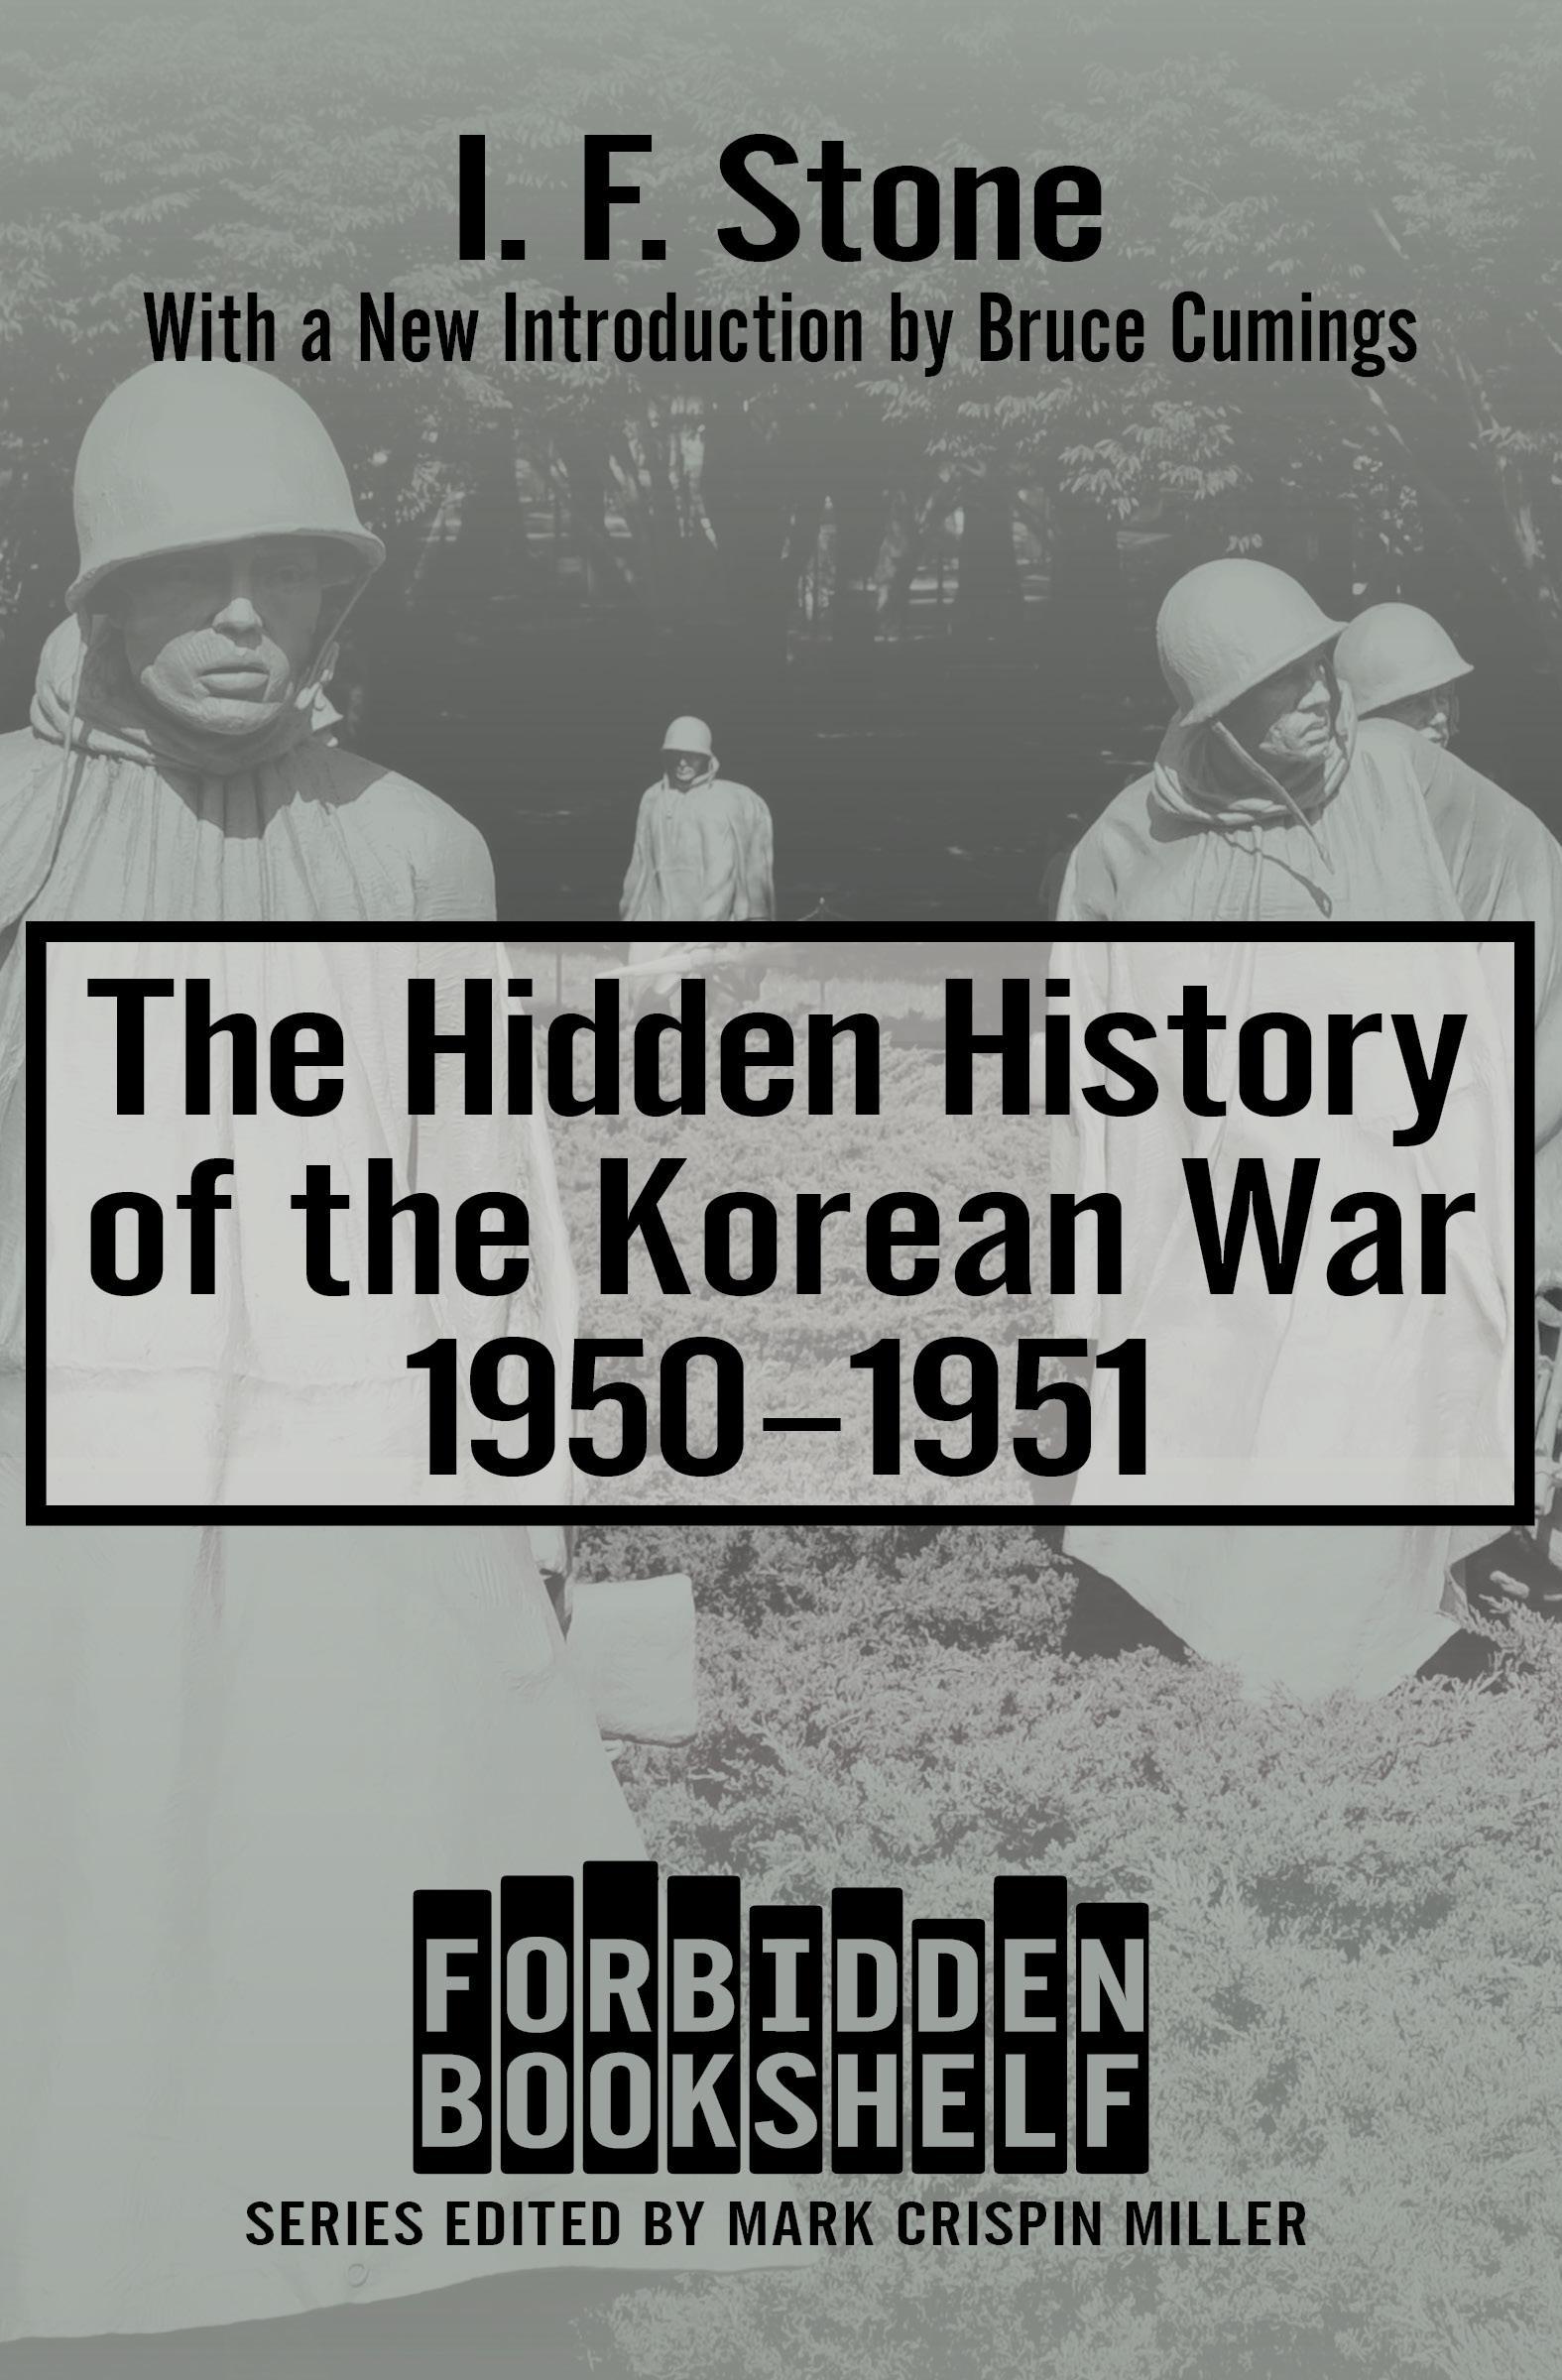 The Hidden History of the Korean War